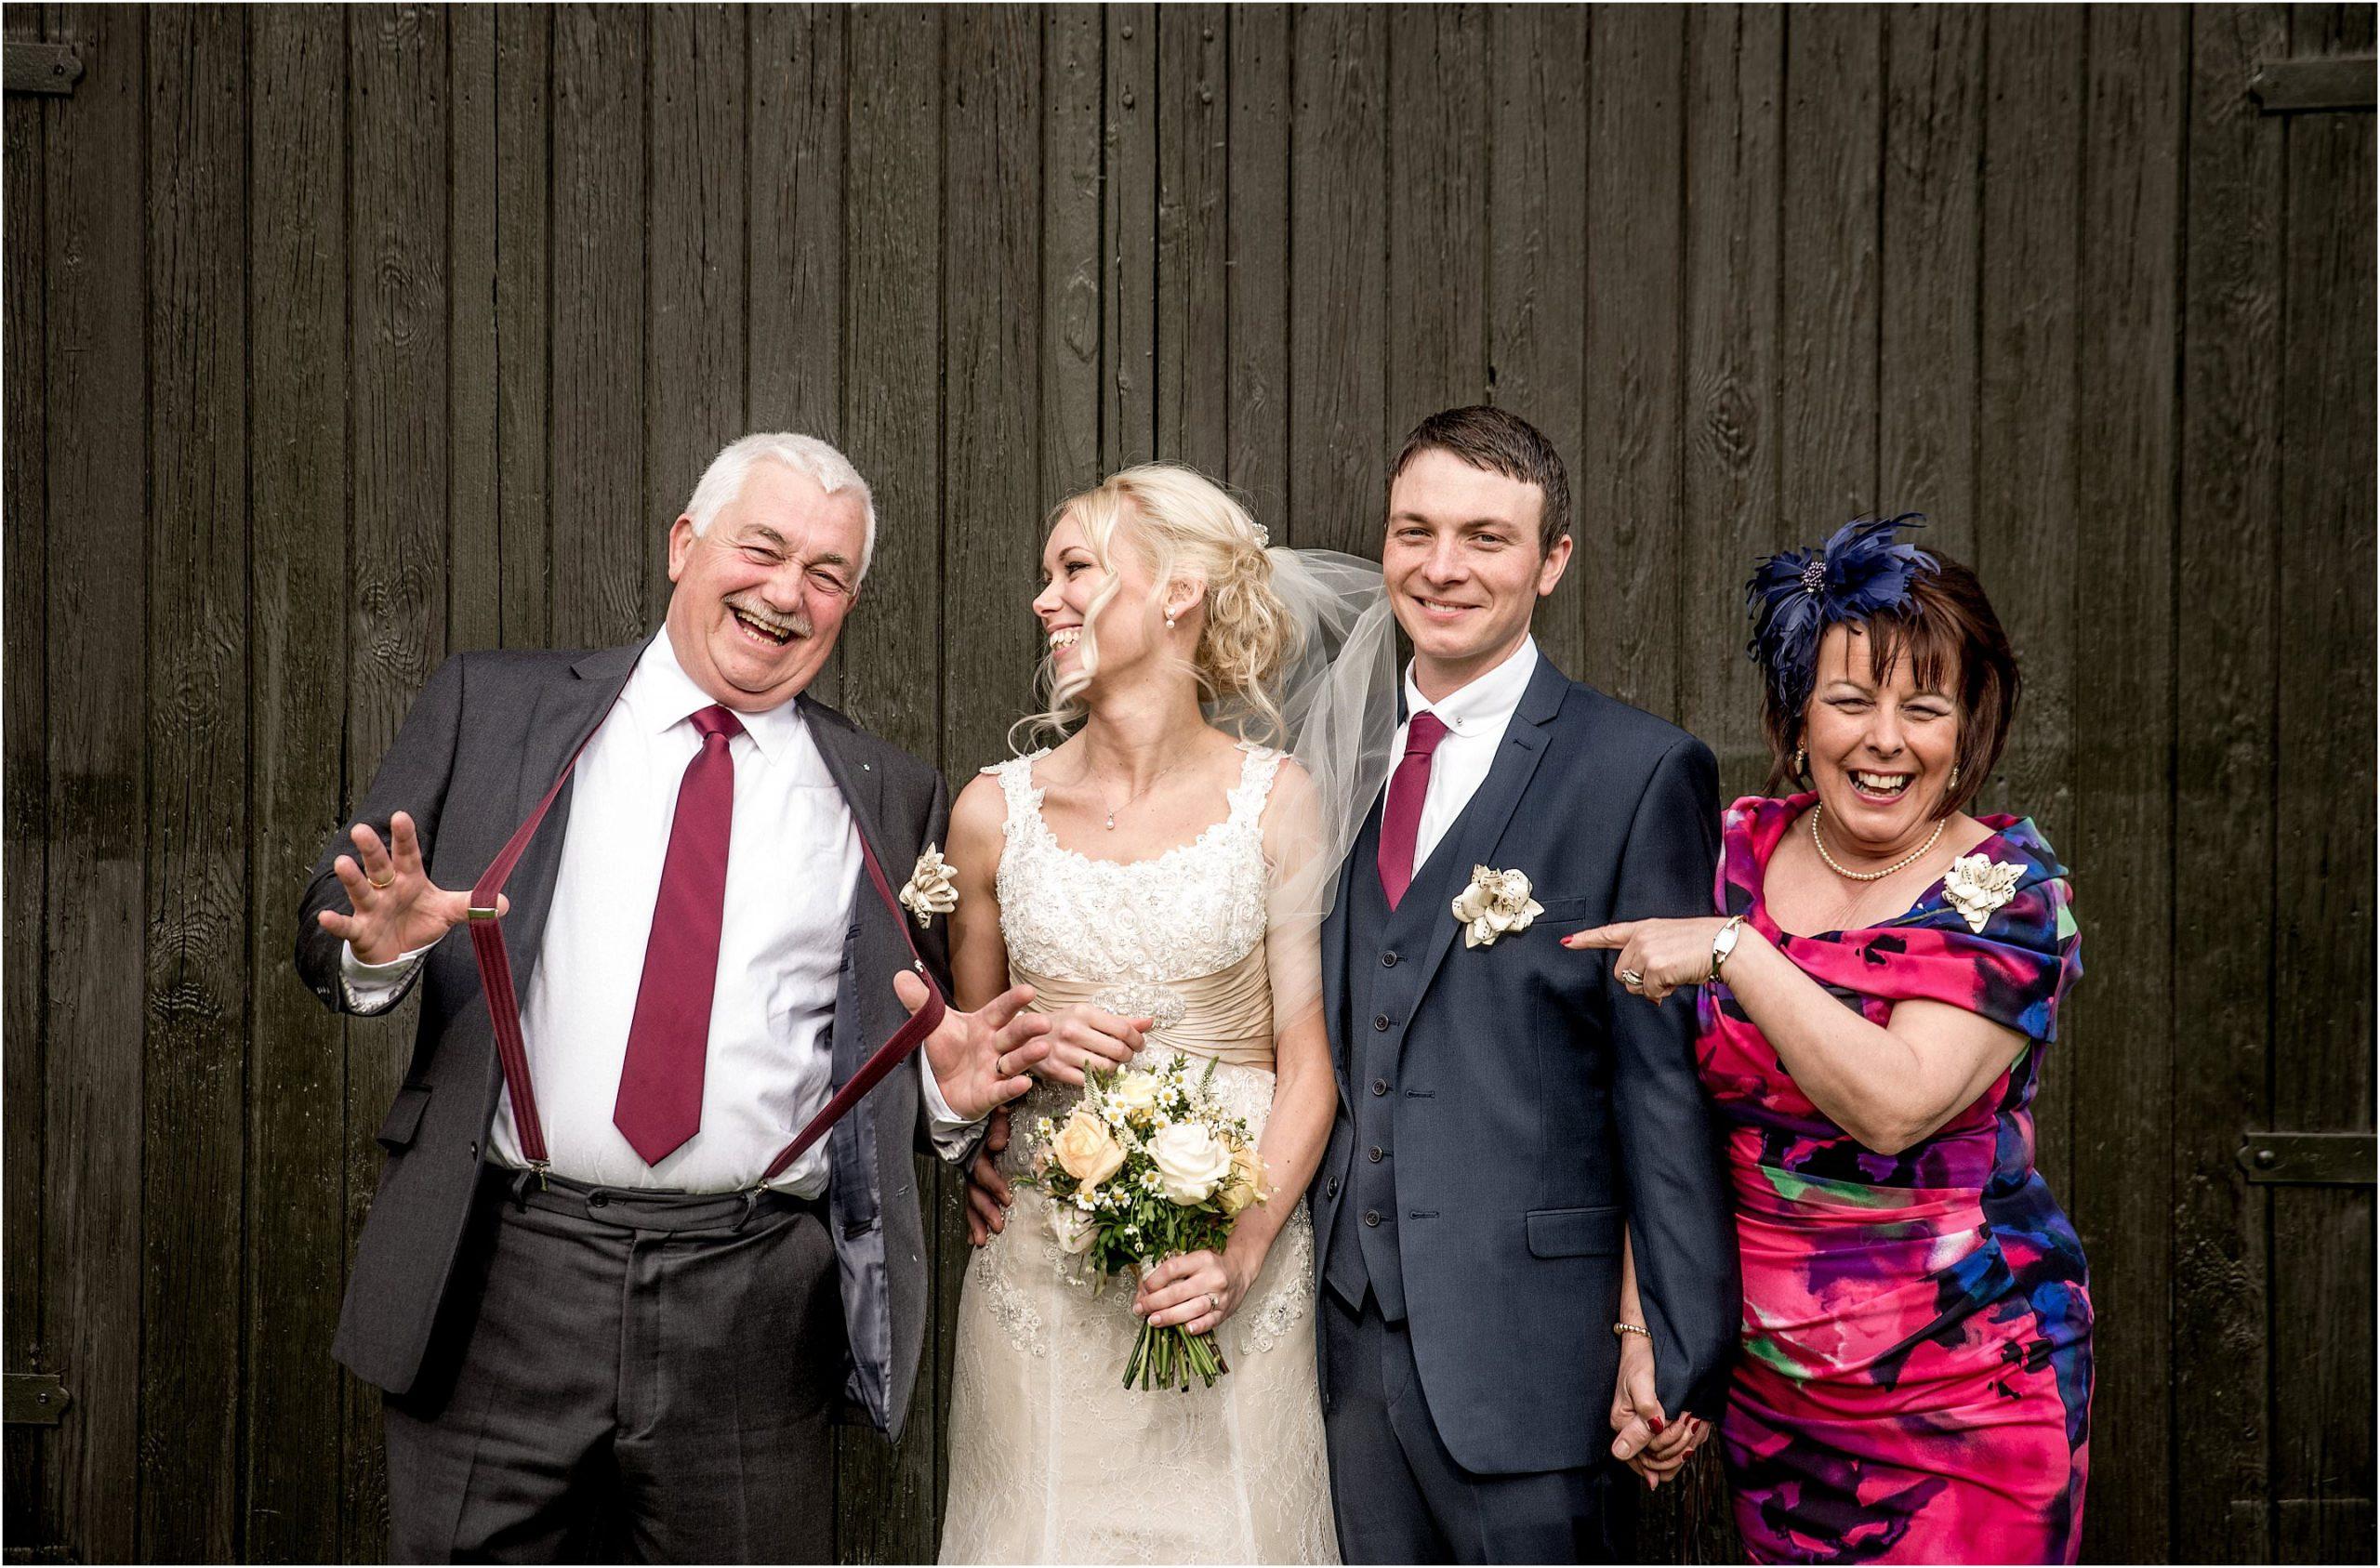 group shots formal wedding photos